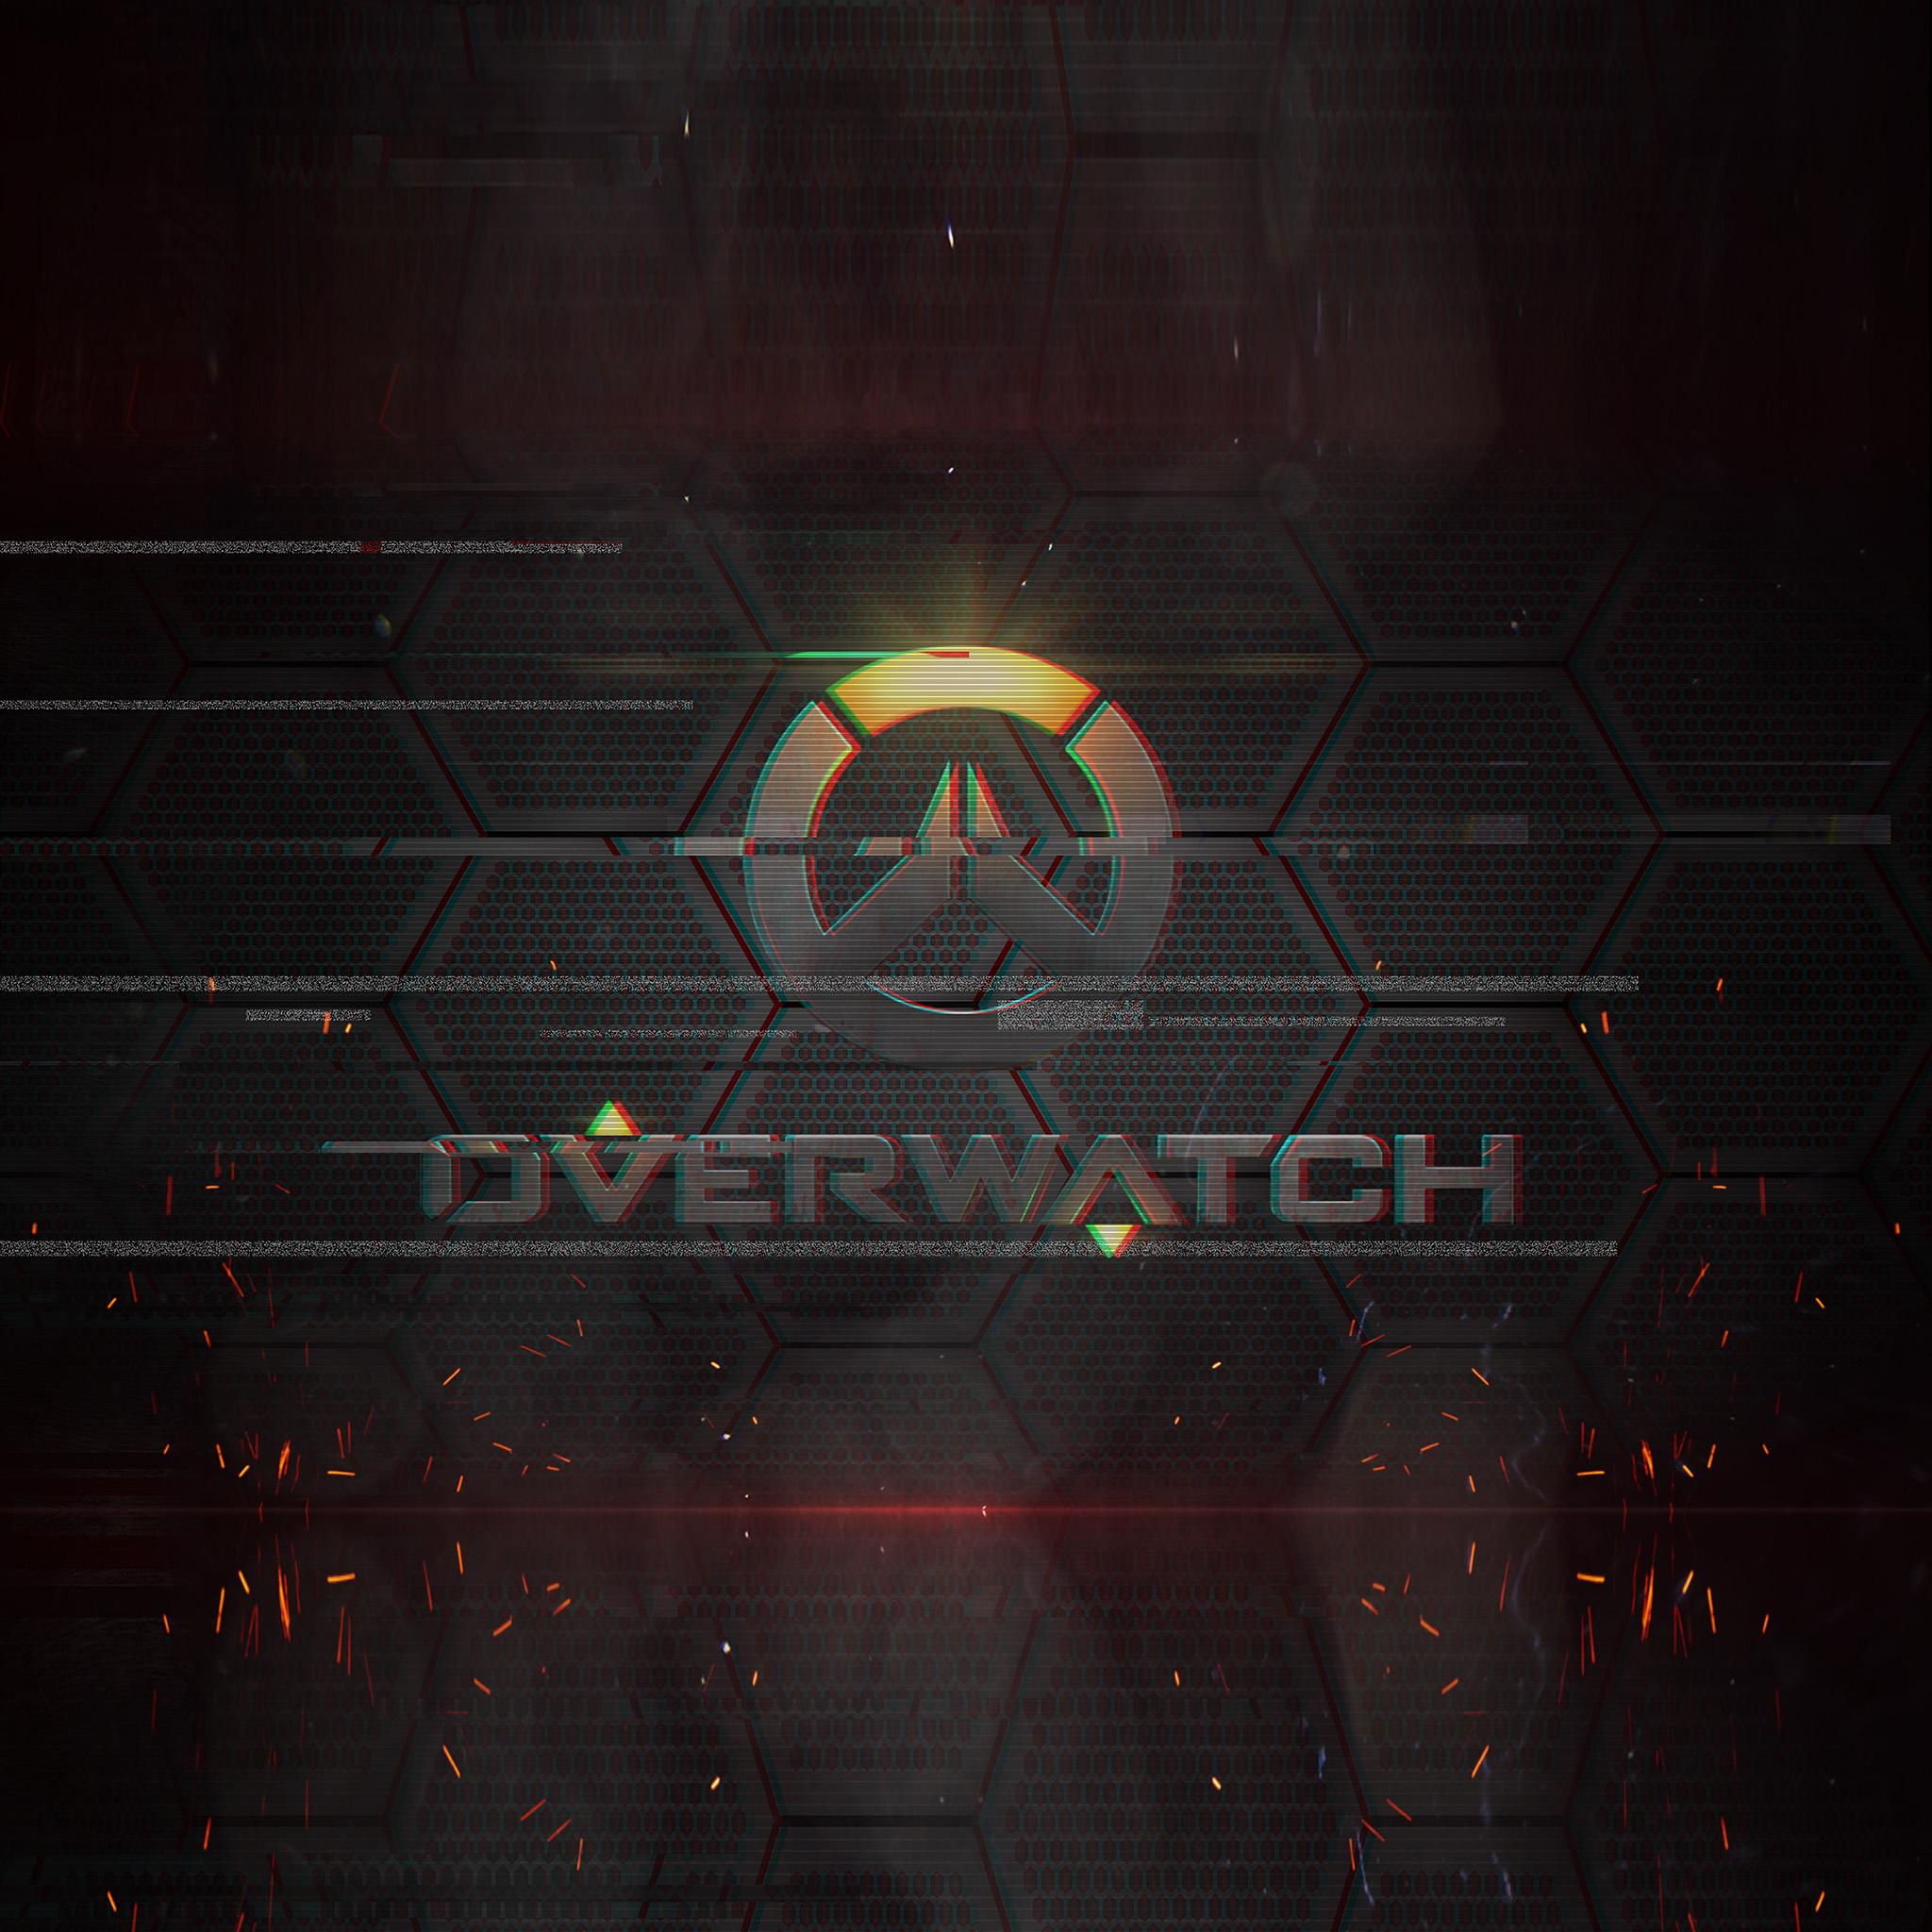 Halloween Desktop Wallpaper Hd As13 Overwatch Logo Game Art Illustration Wallpaper